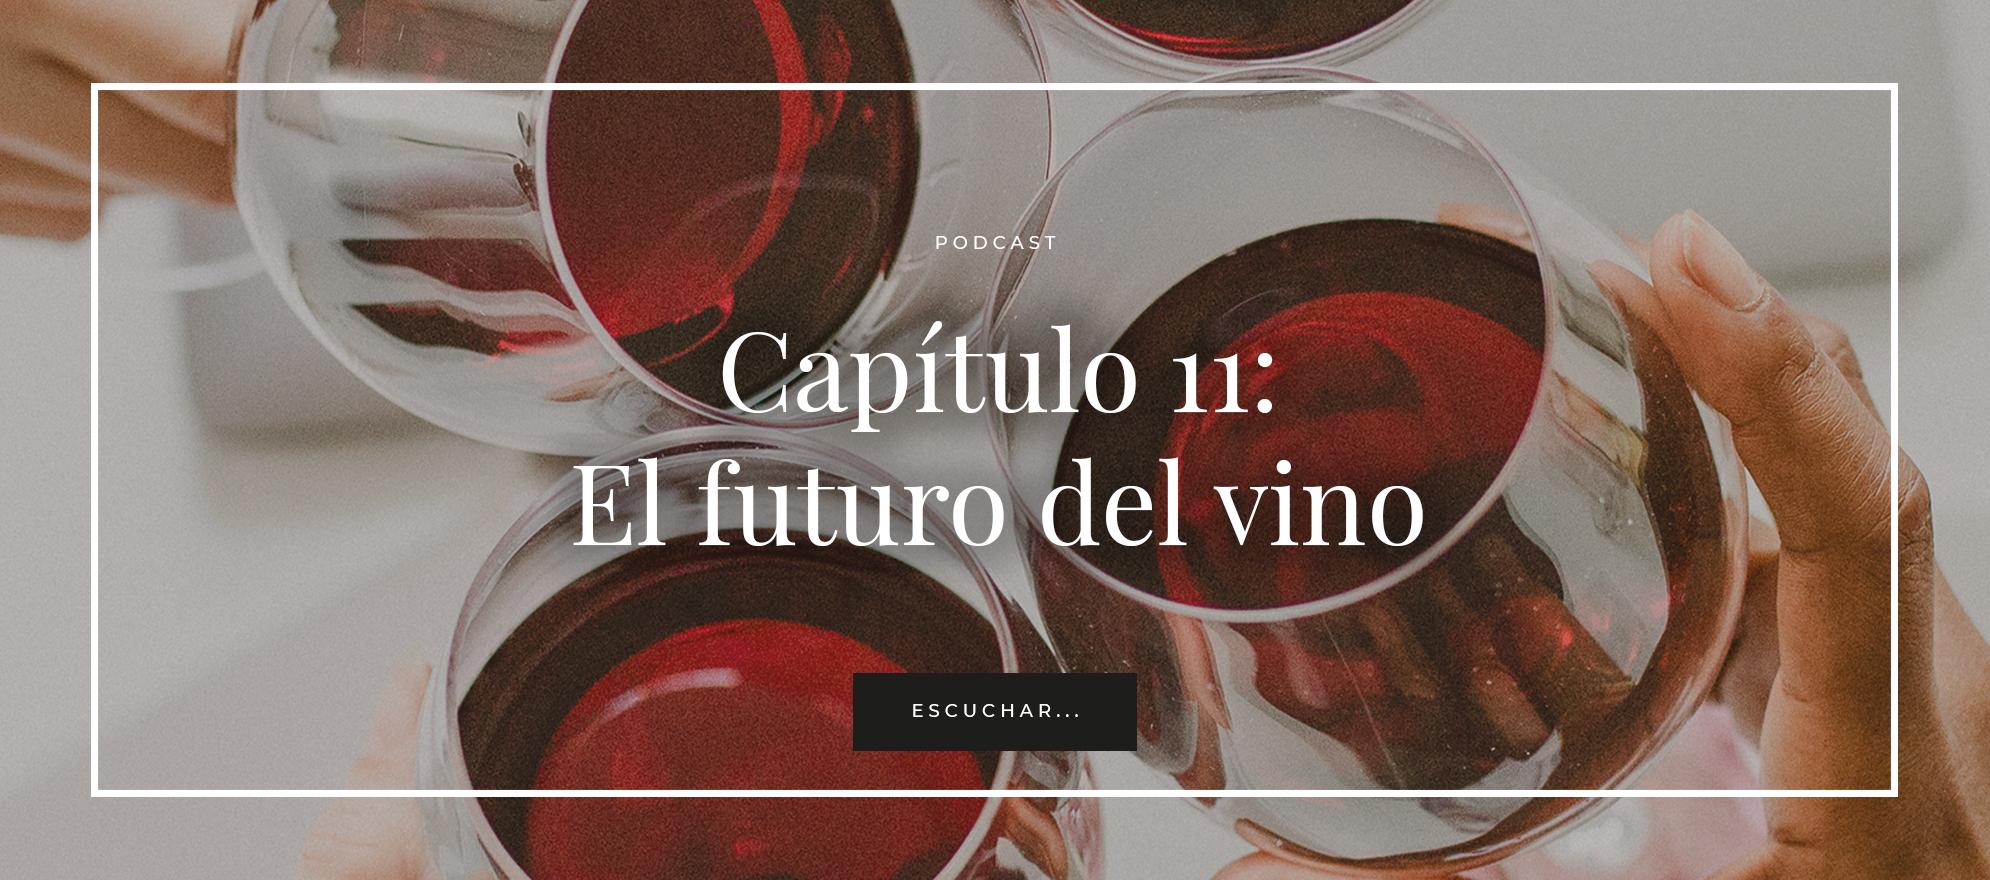 podcast 11 el futuro del vino. Matarromera